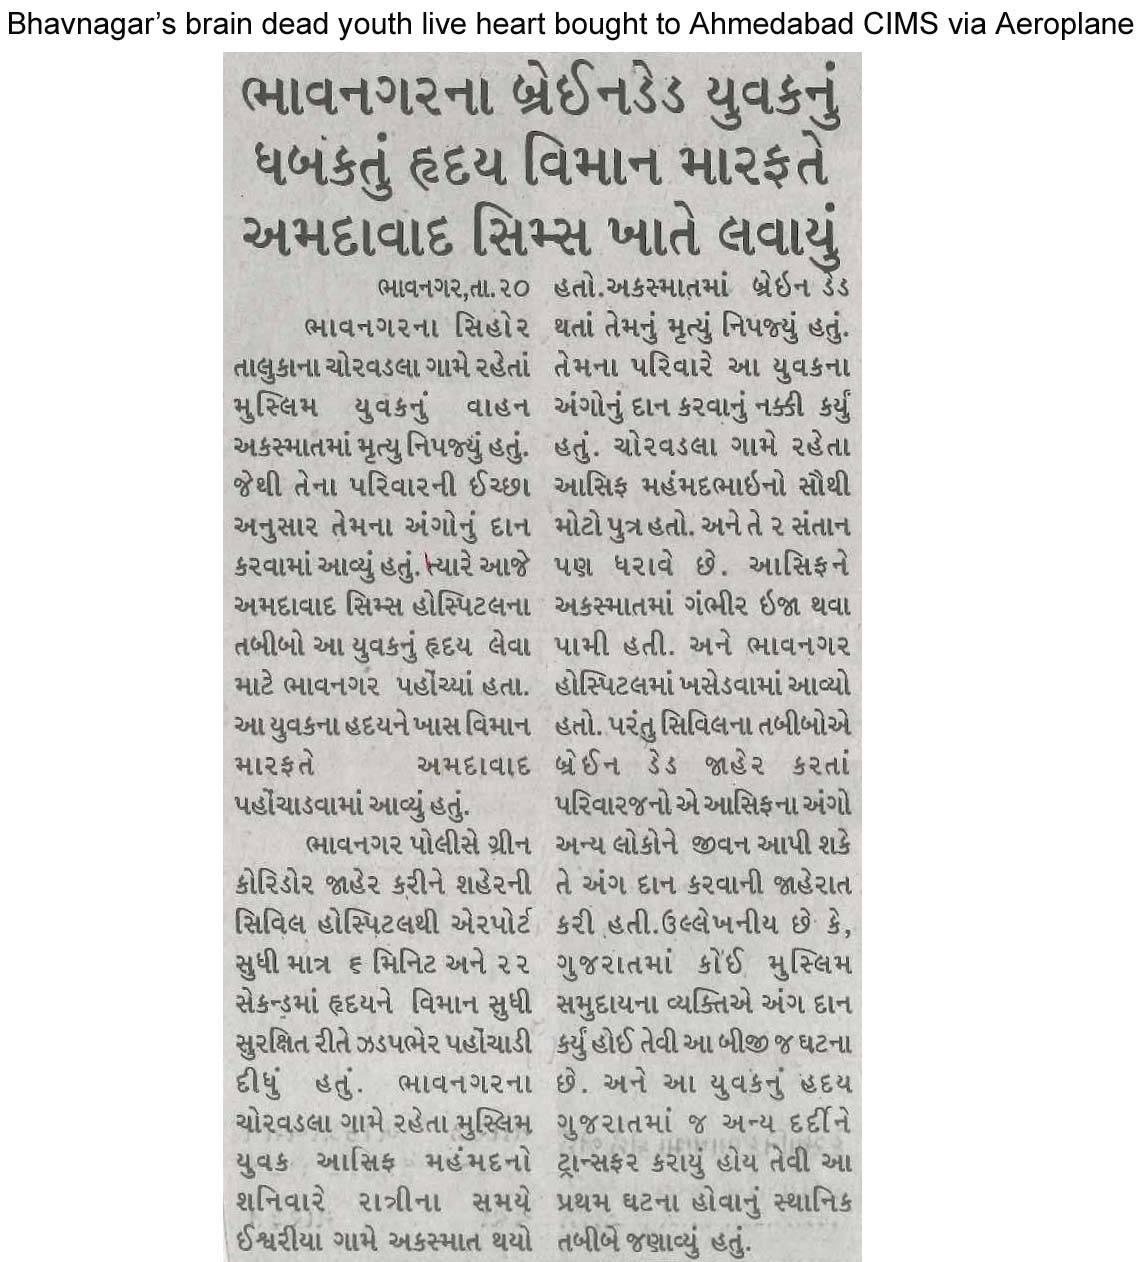 Saurashtra Bhoomi (Junagadh)_CIMS (1st Heart transplant in Gujarat)_20.12.16_Pg 06